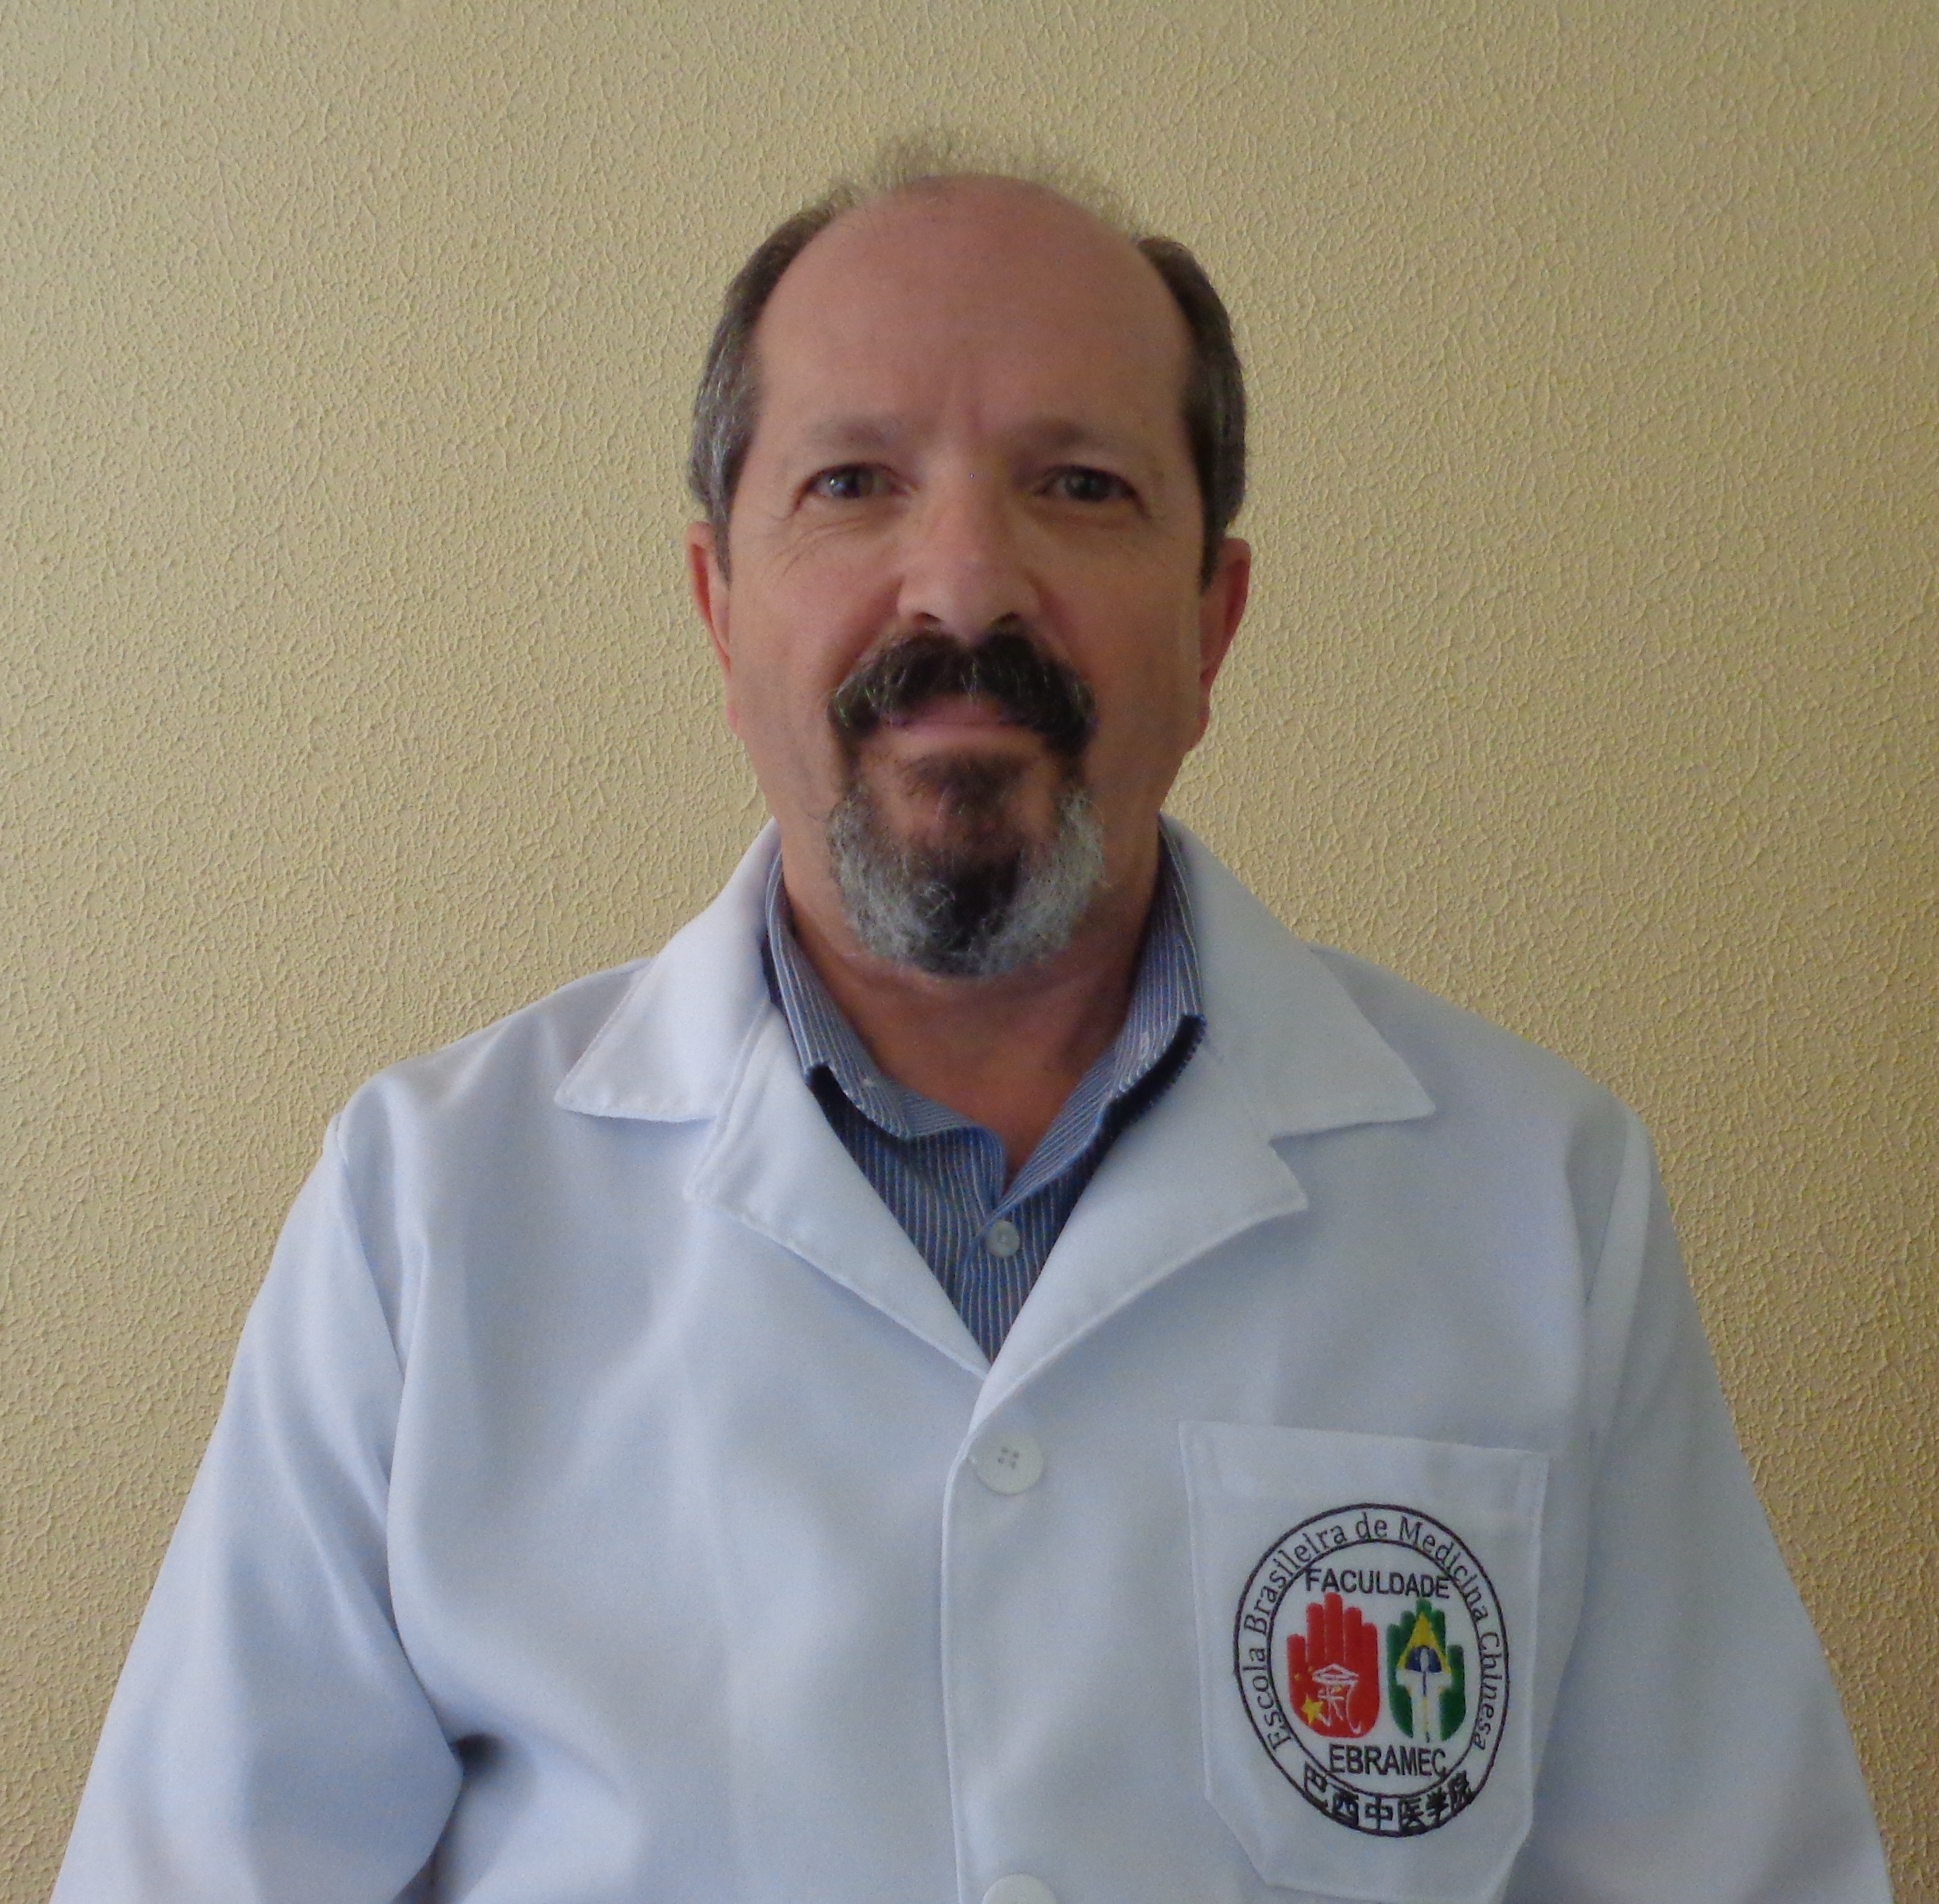 Miguel Gomes Neto